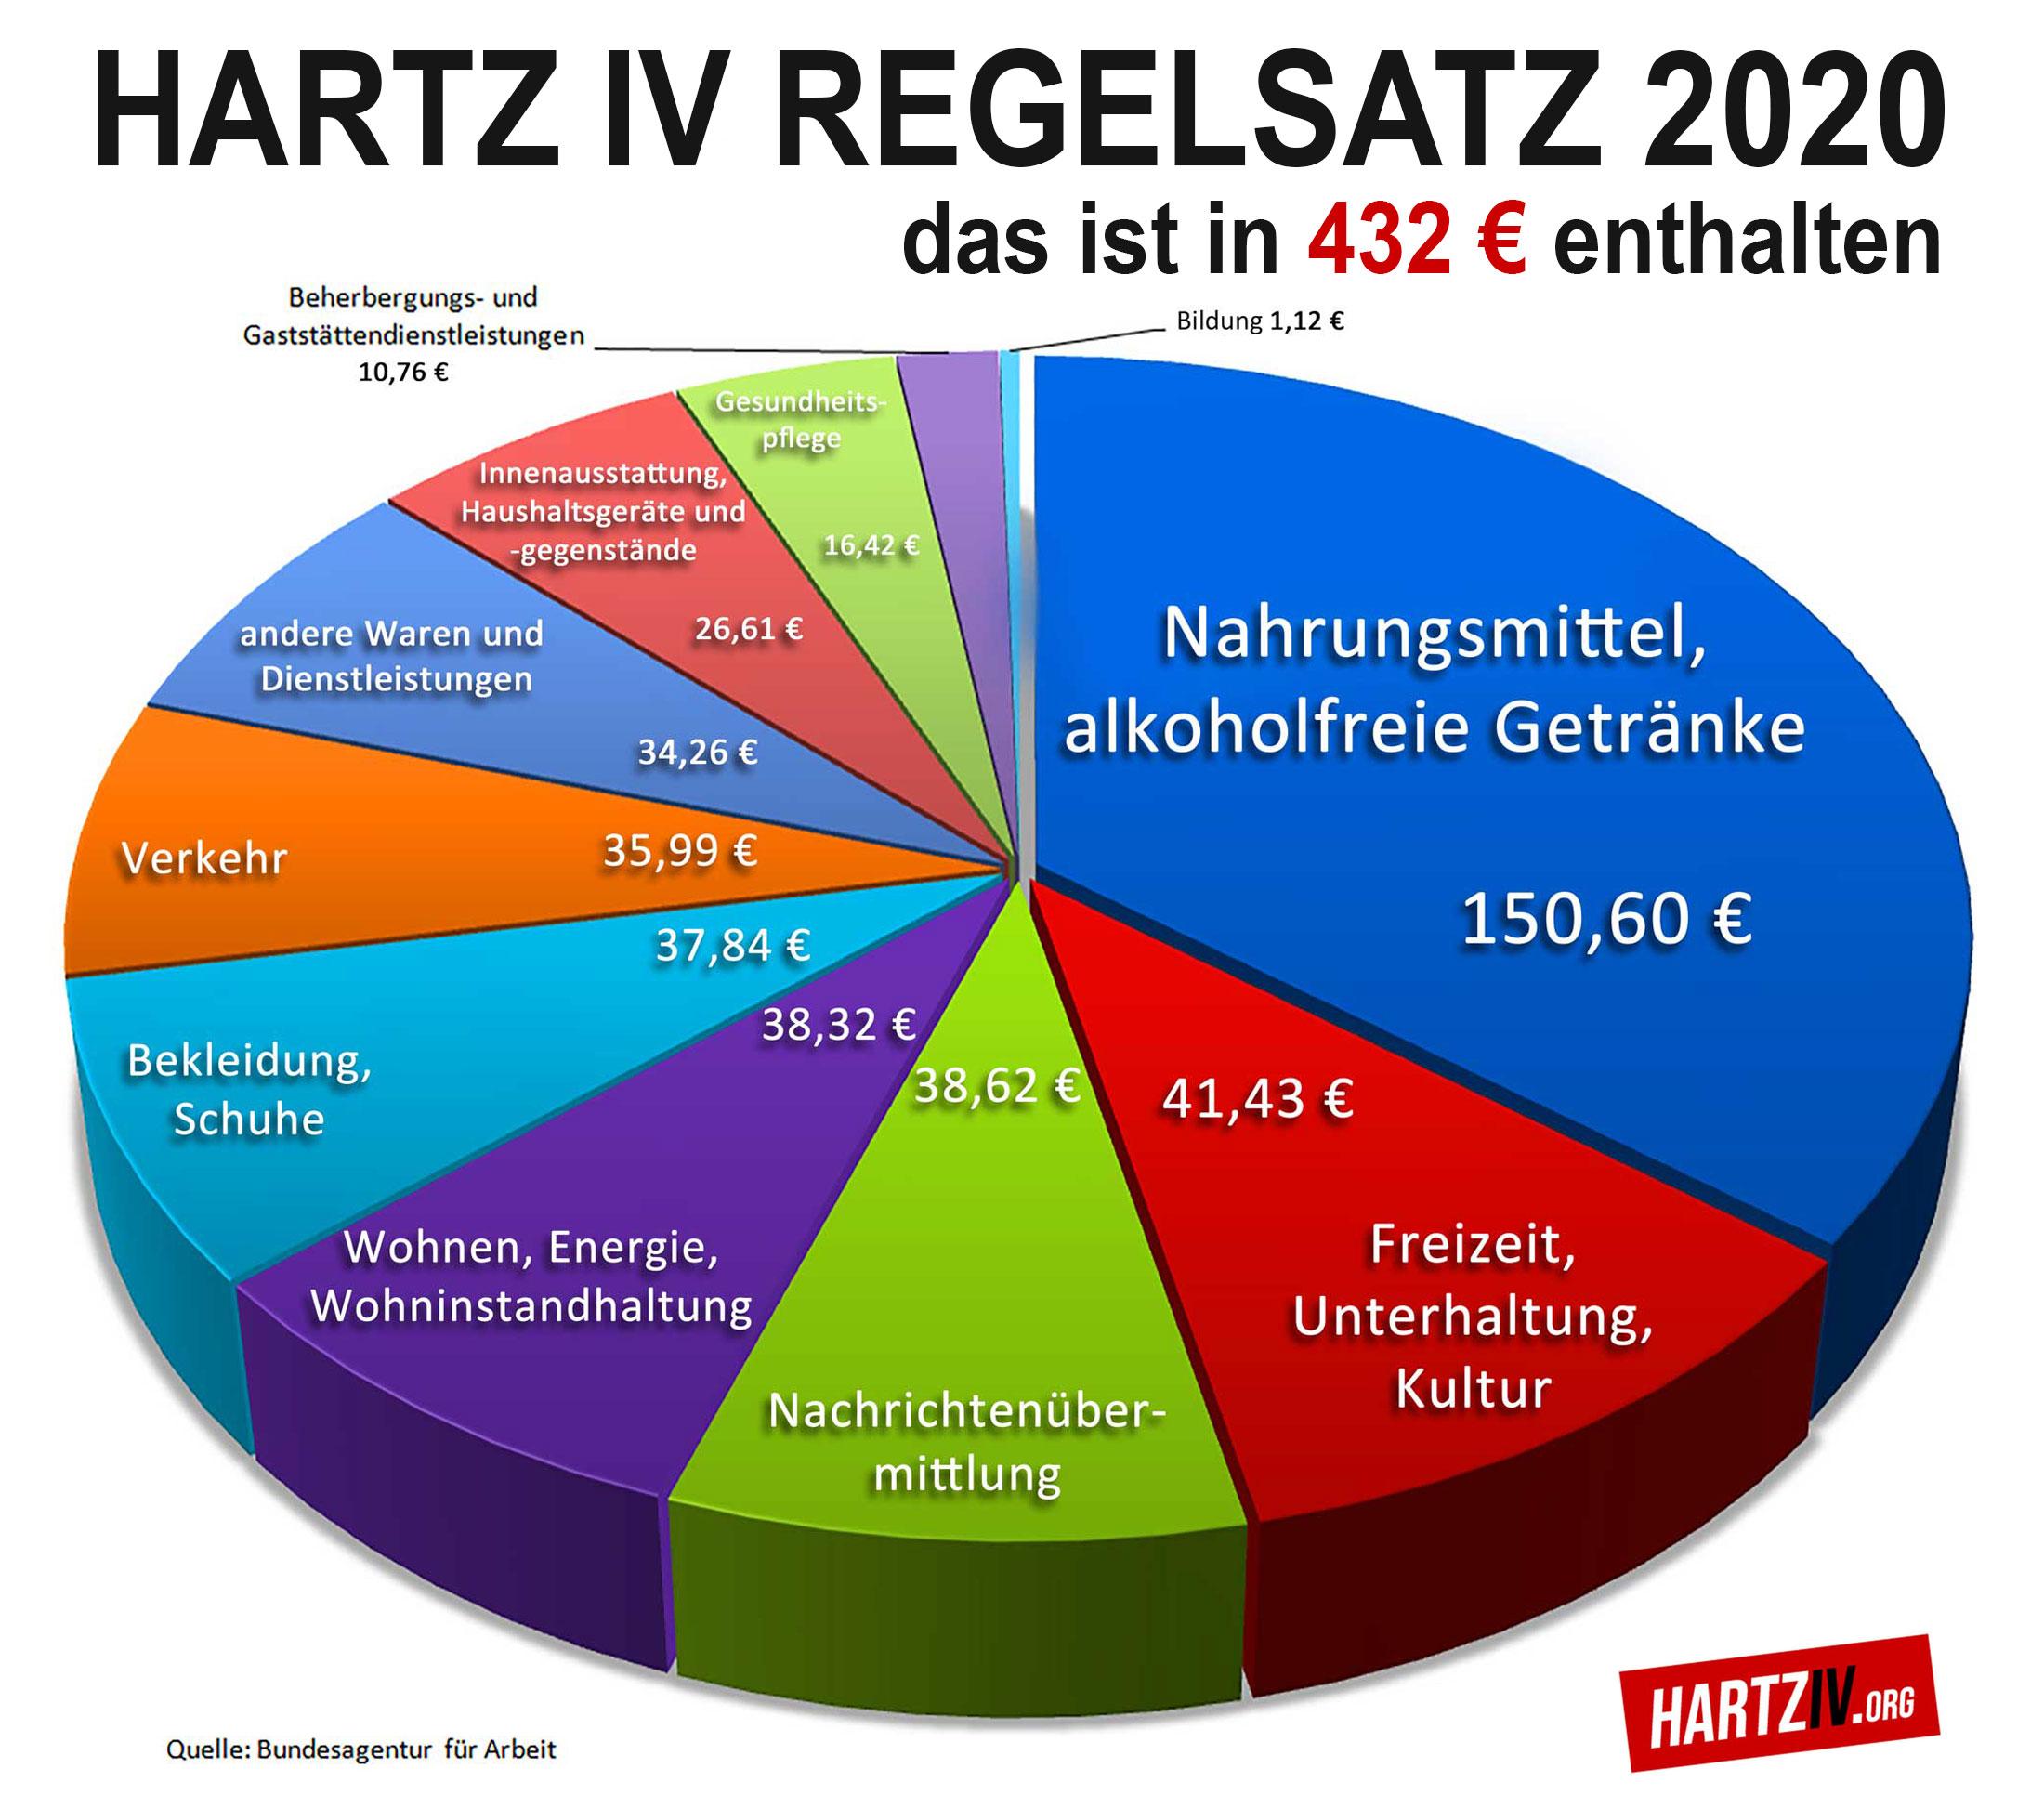 Hartz-IV-Regelsatz-2020